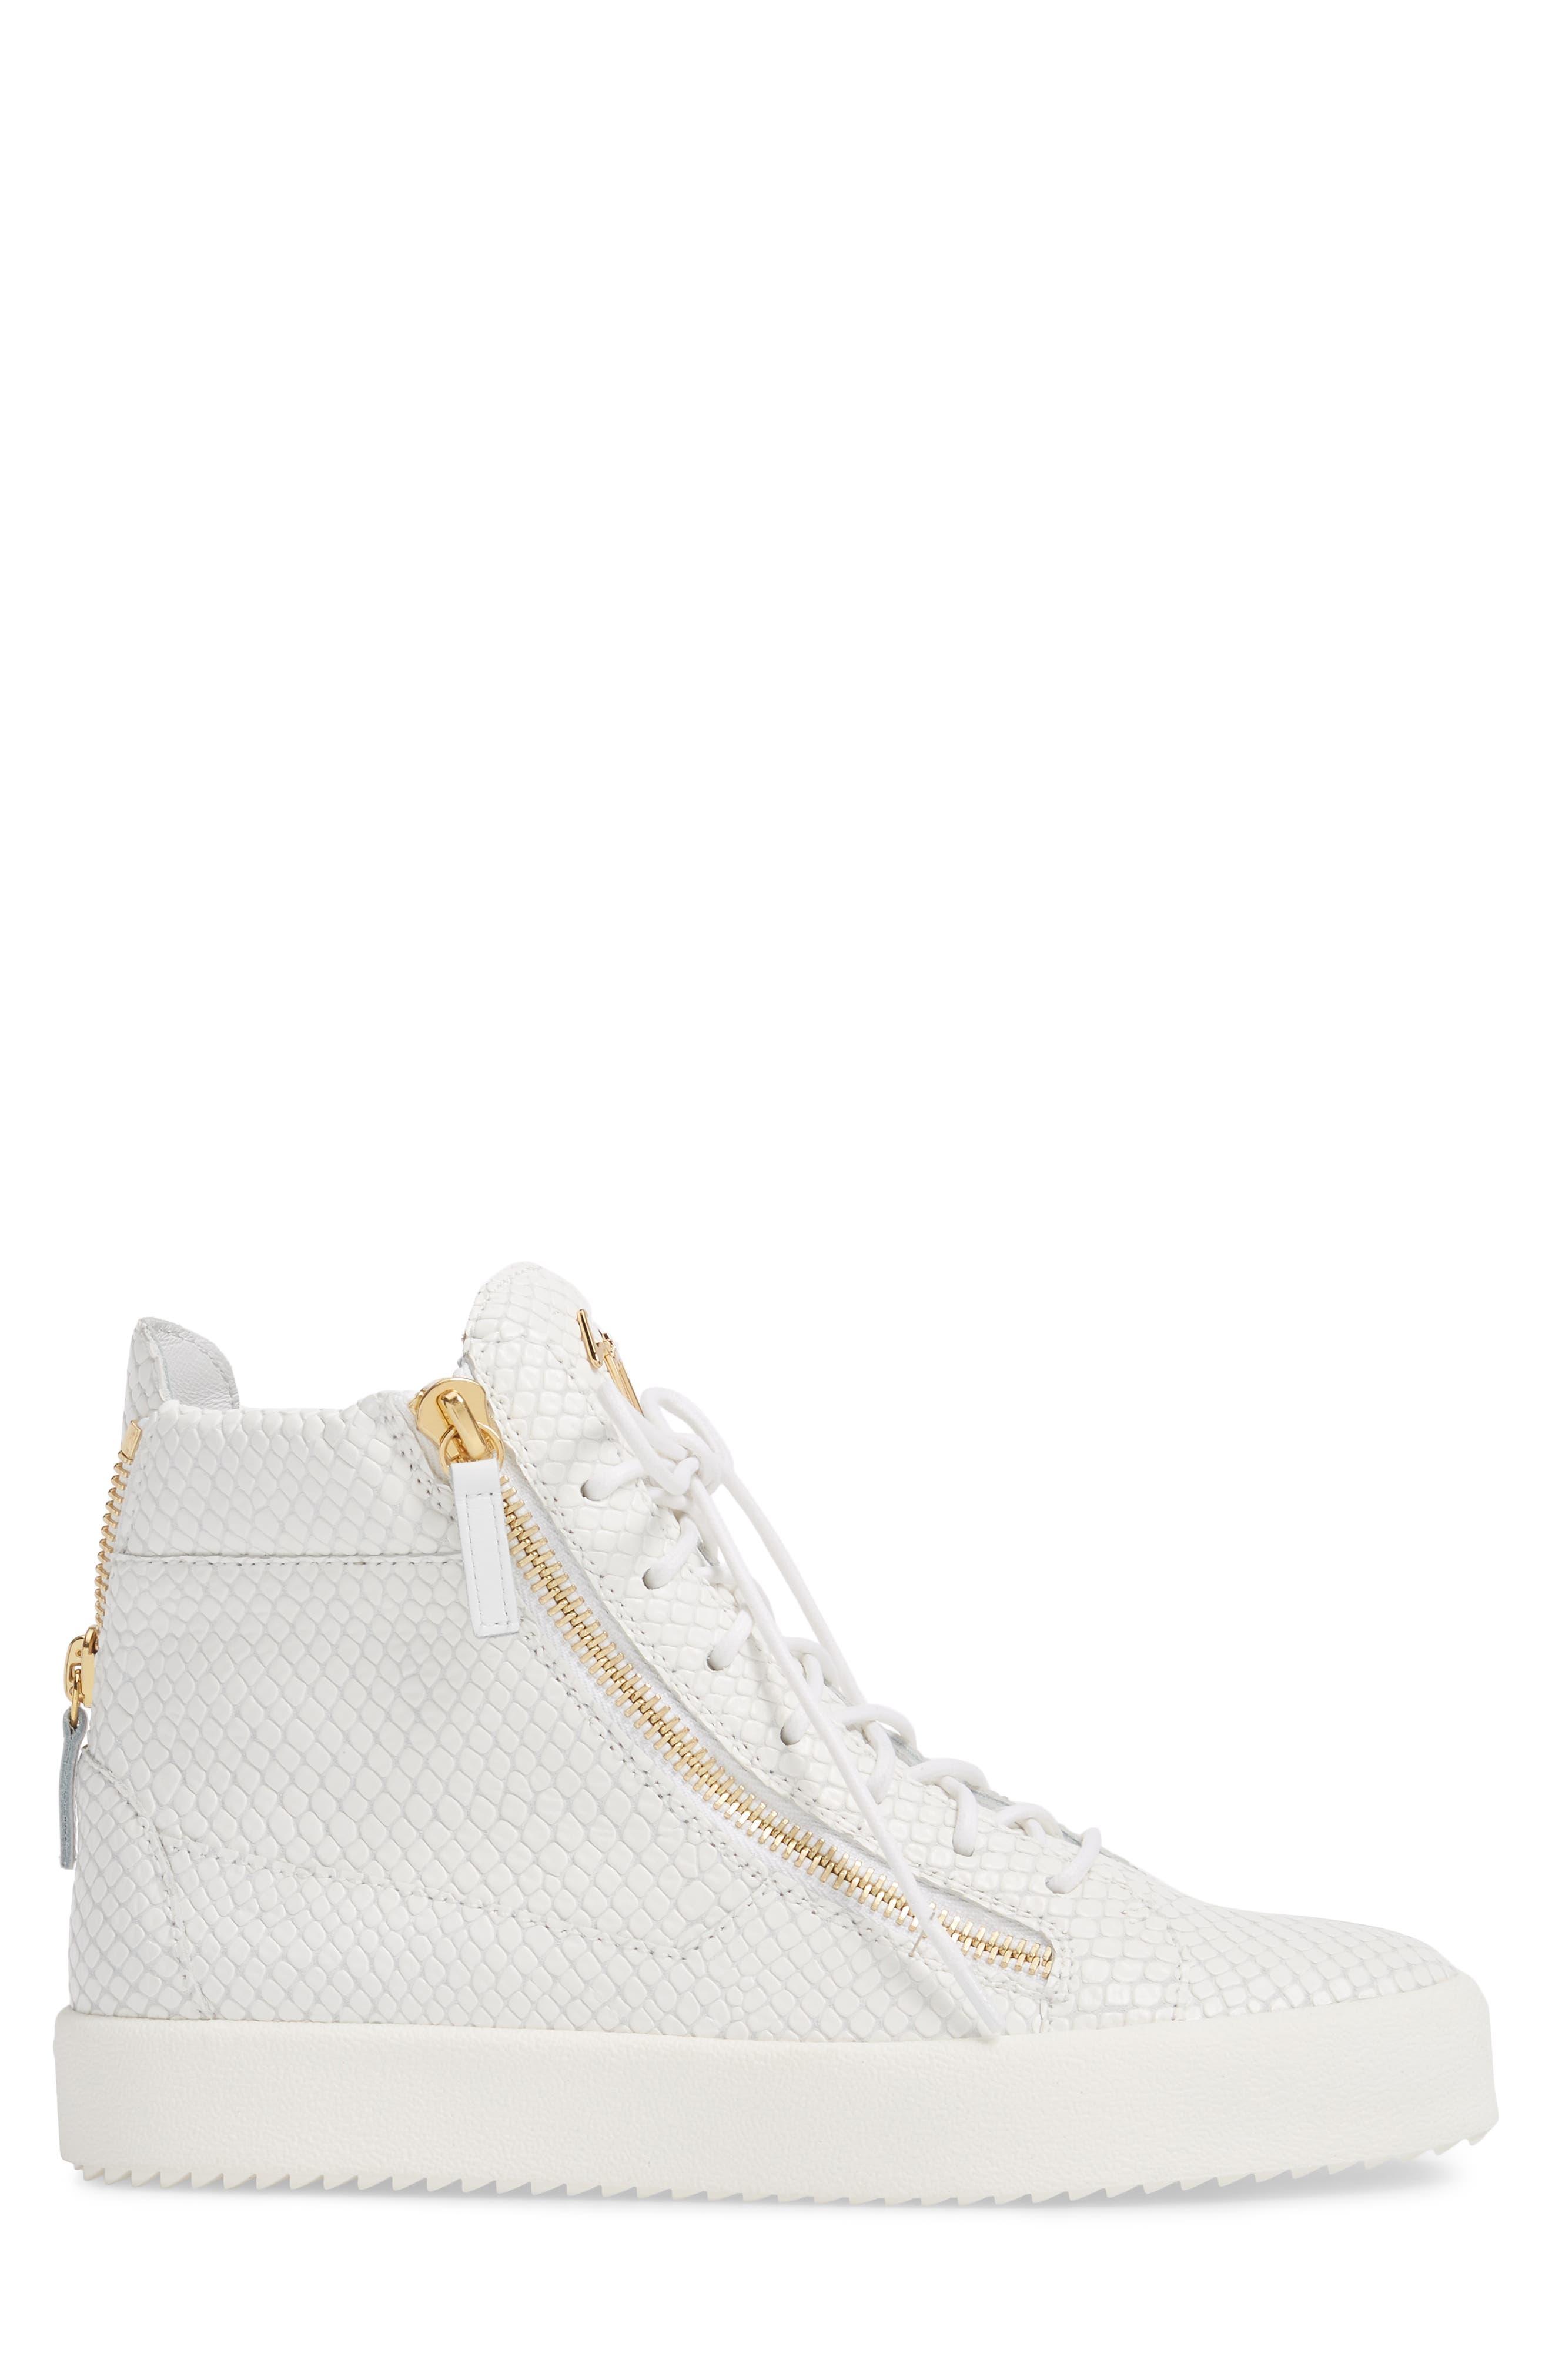 Snake Embossed High Top Sneaker,                             Alternate thumbnail 3, color,                             BIANCO